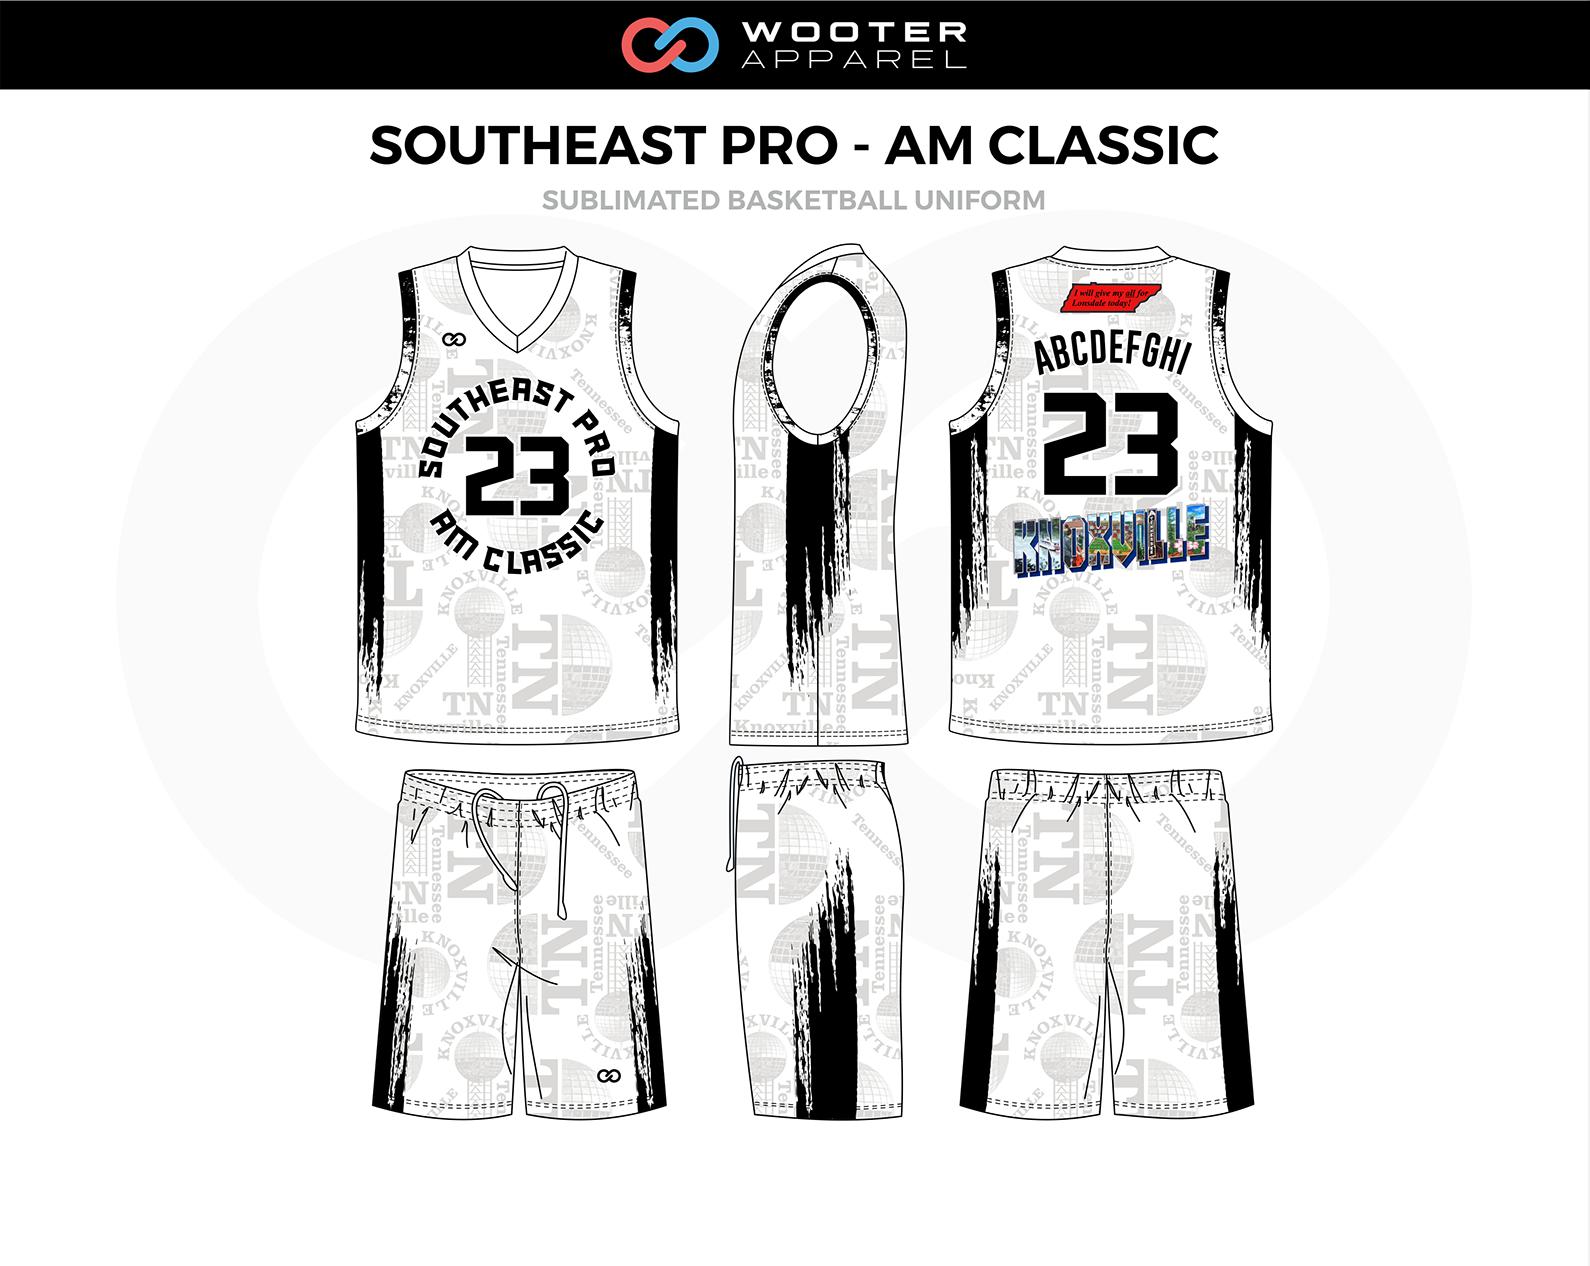 01_Southeast Pro-AM Classic v2.png